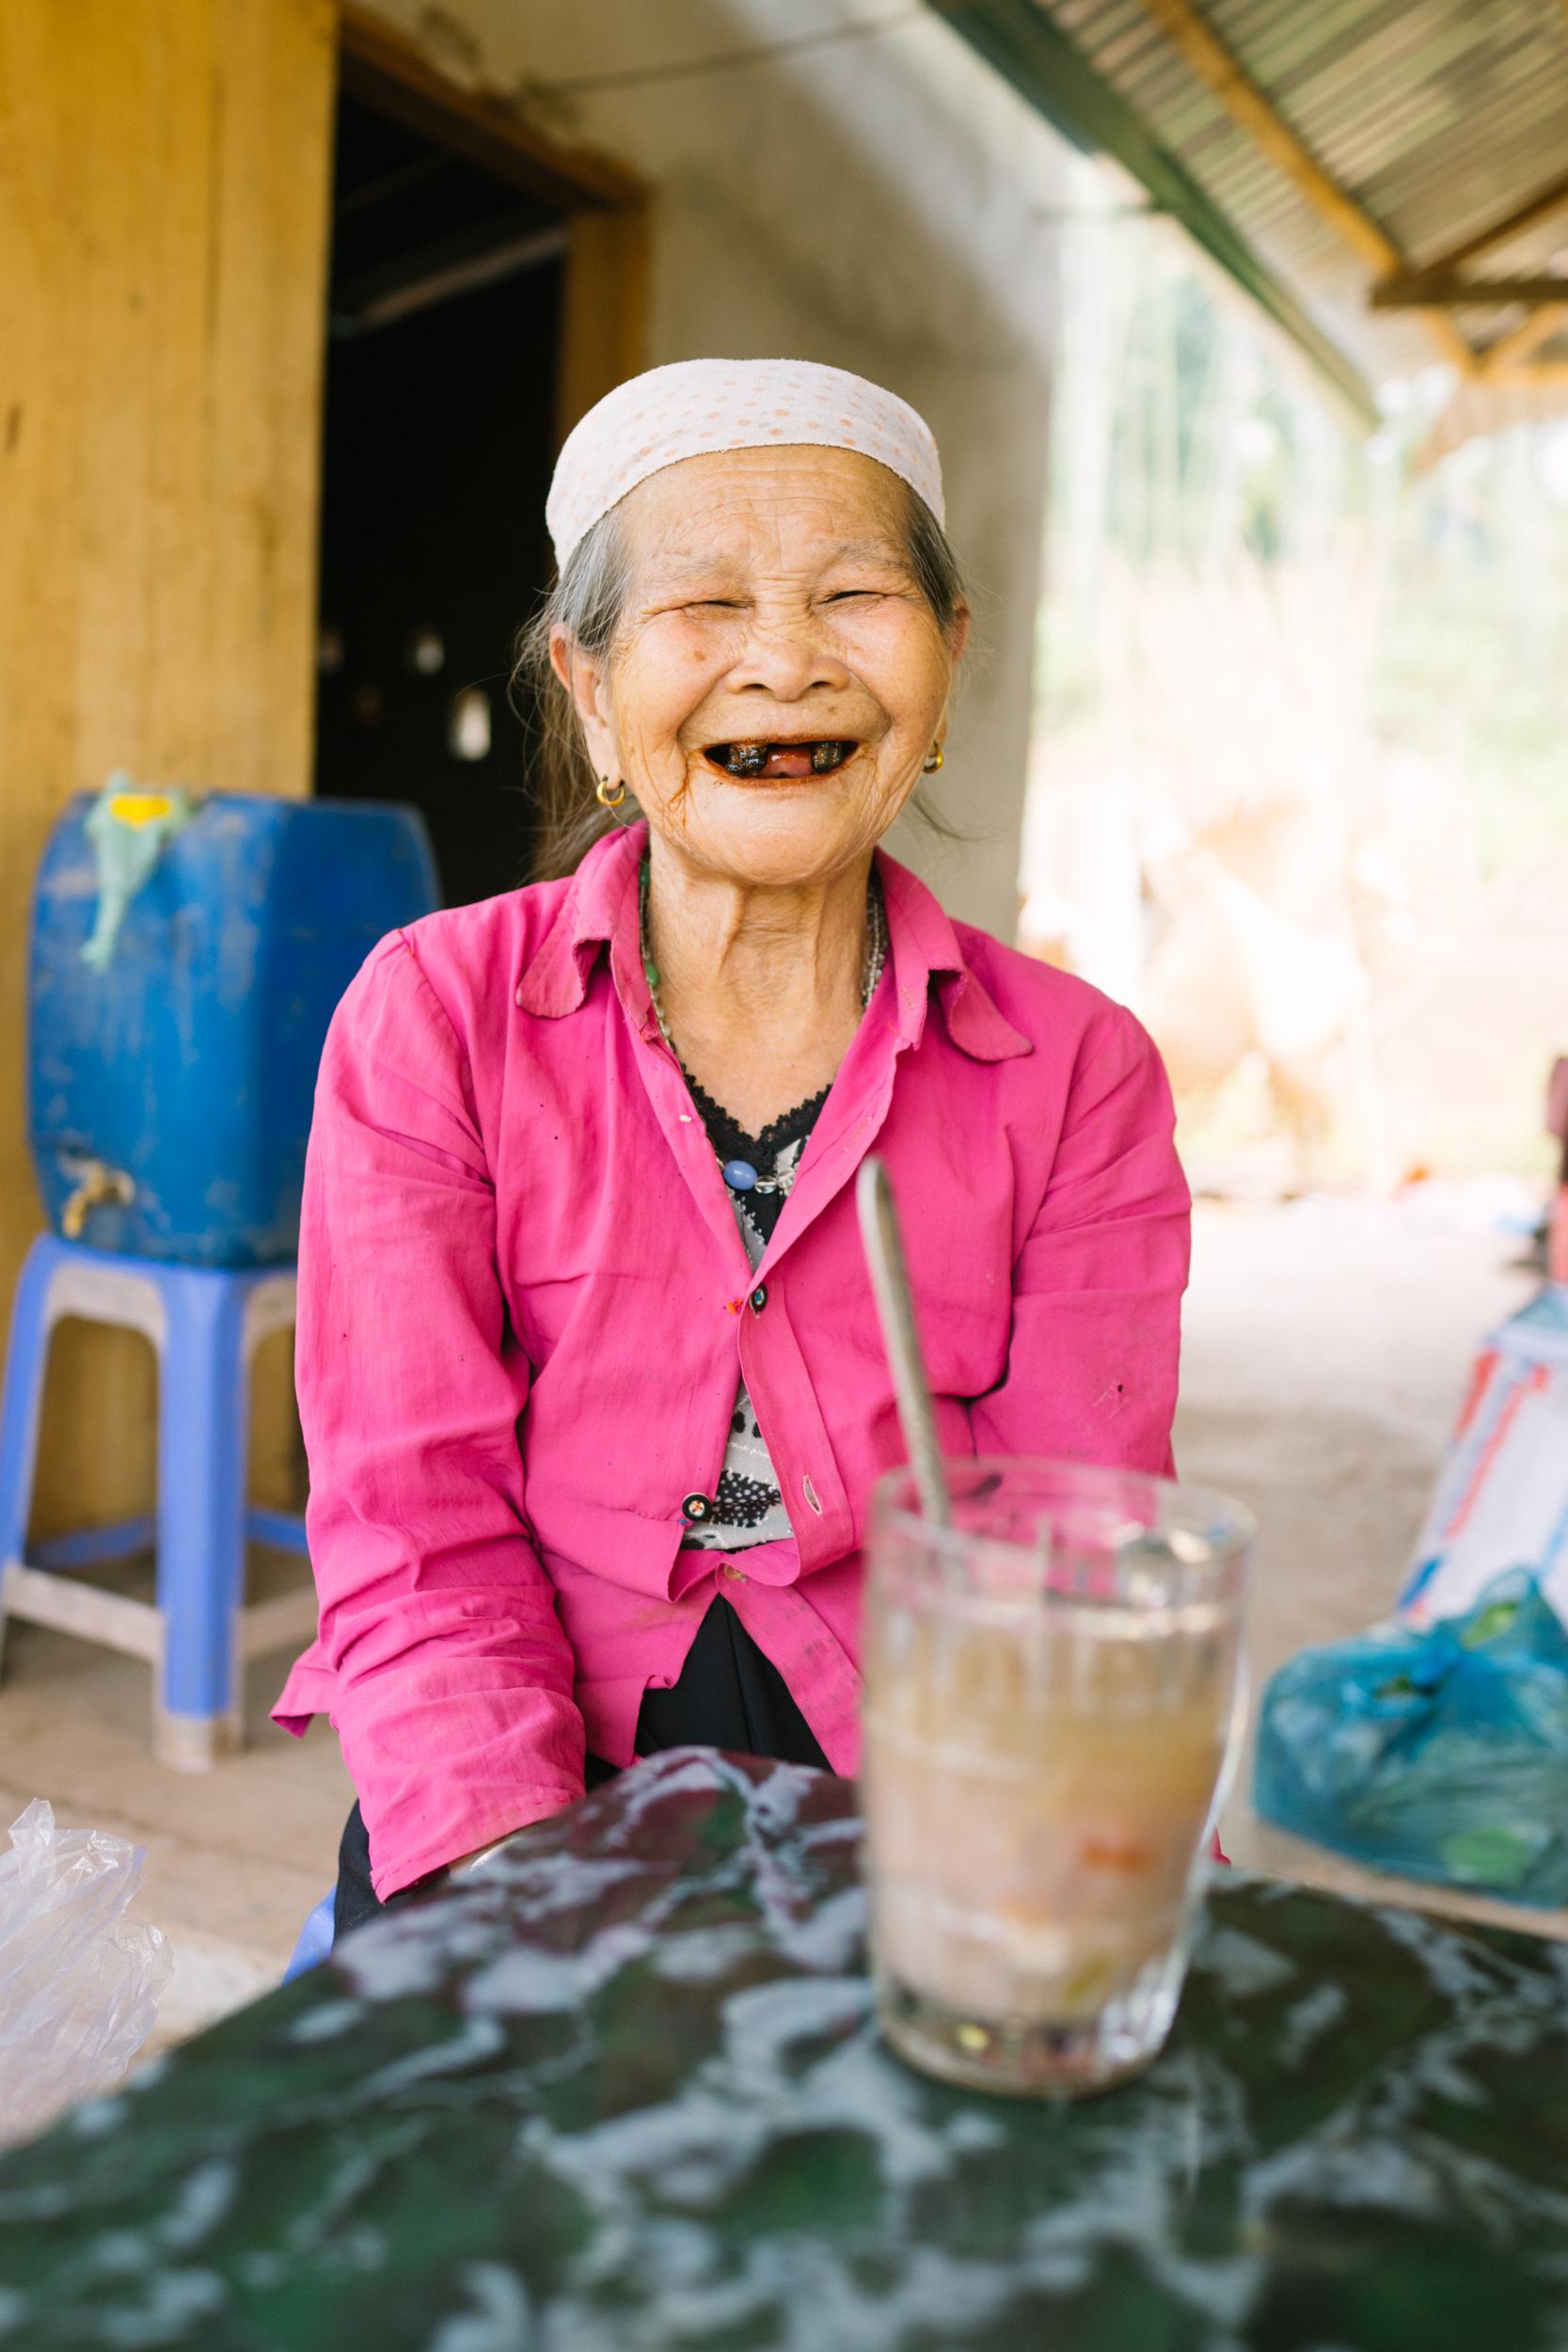 vietnam-project-apr-2015_0104.jpg